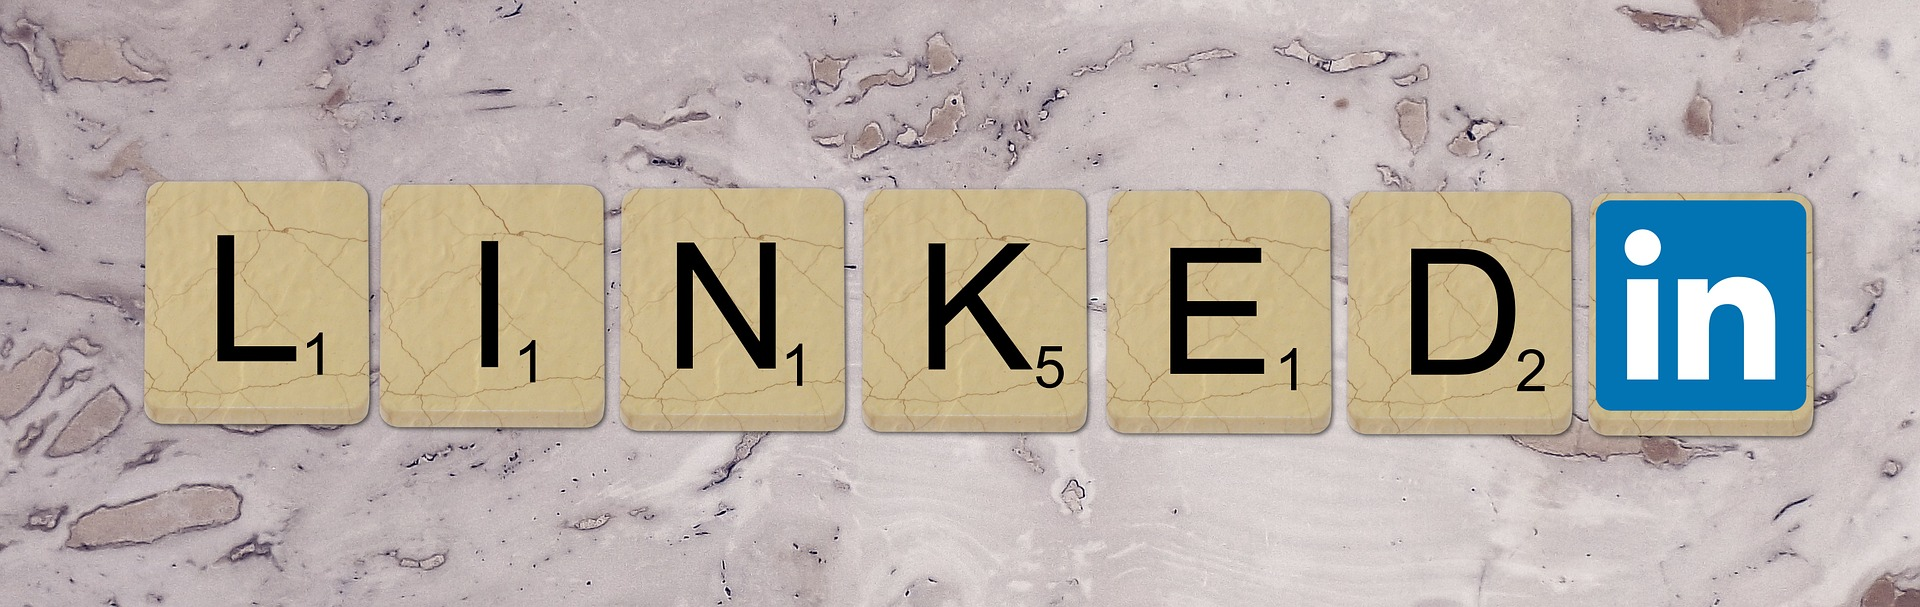 come funziona l'algoritmo di linkedin